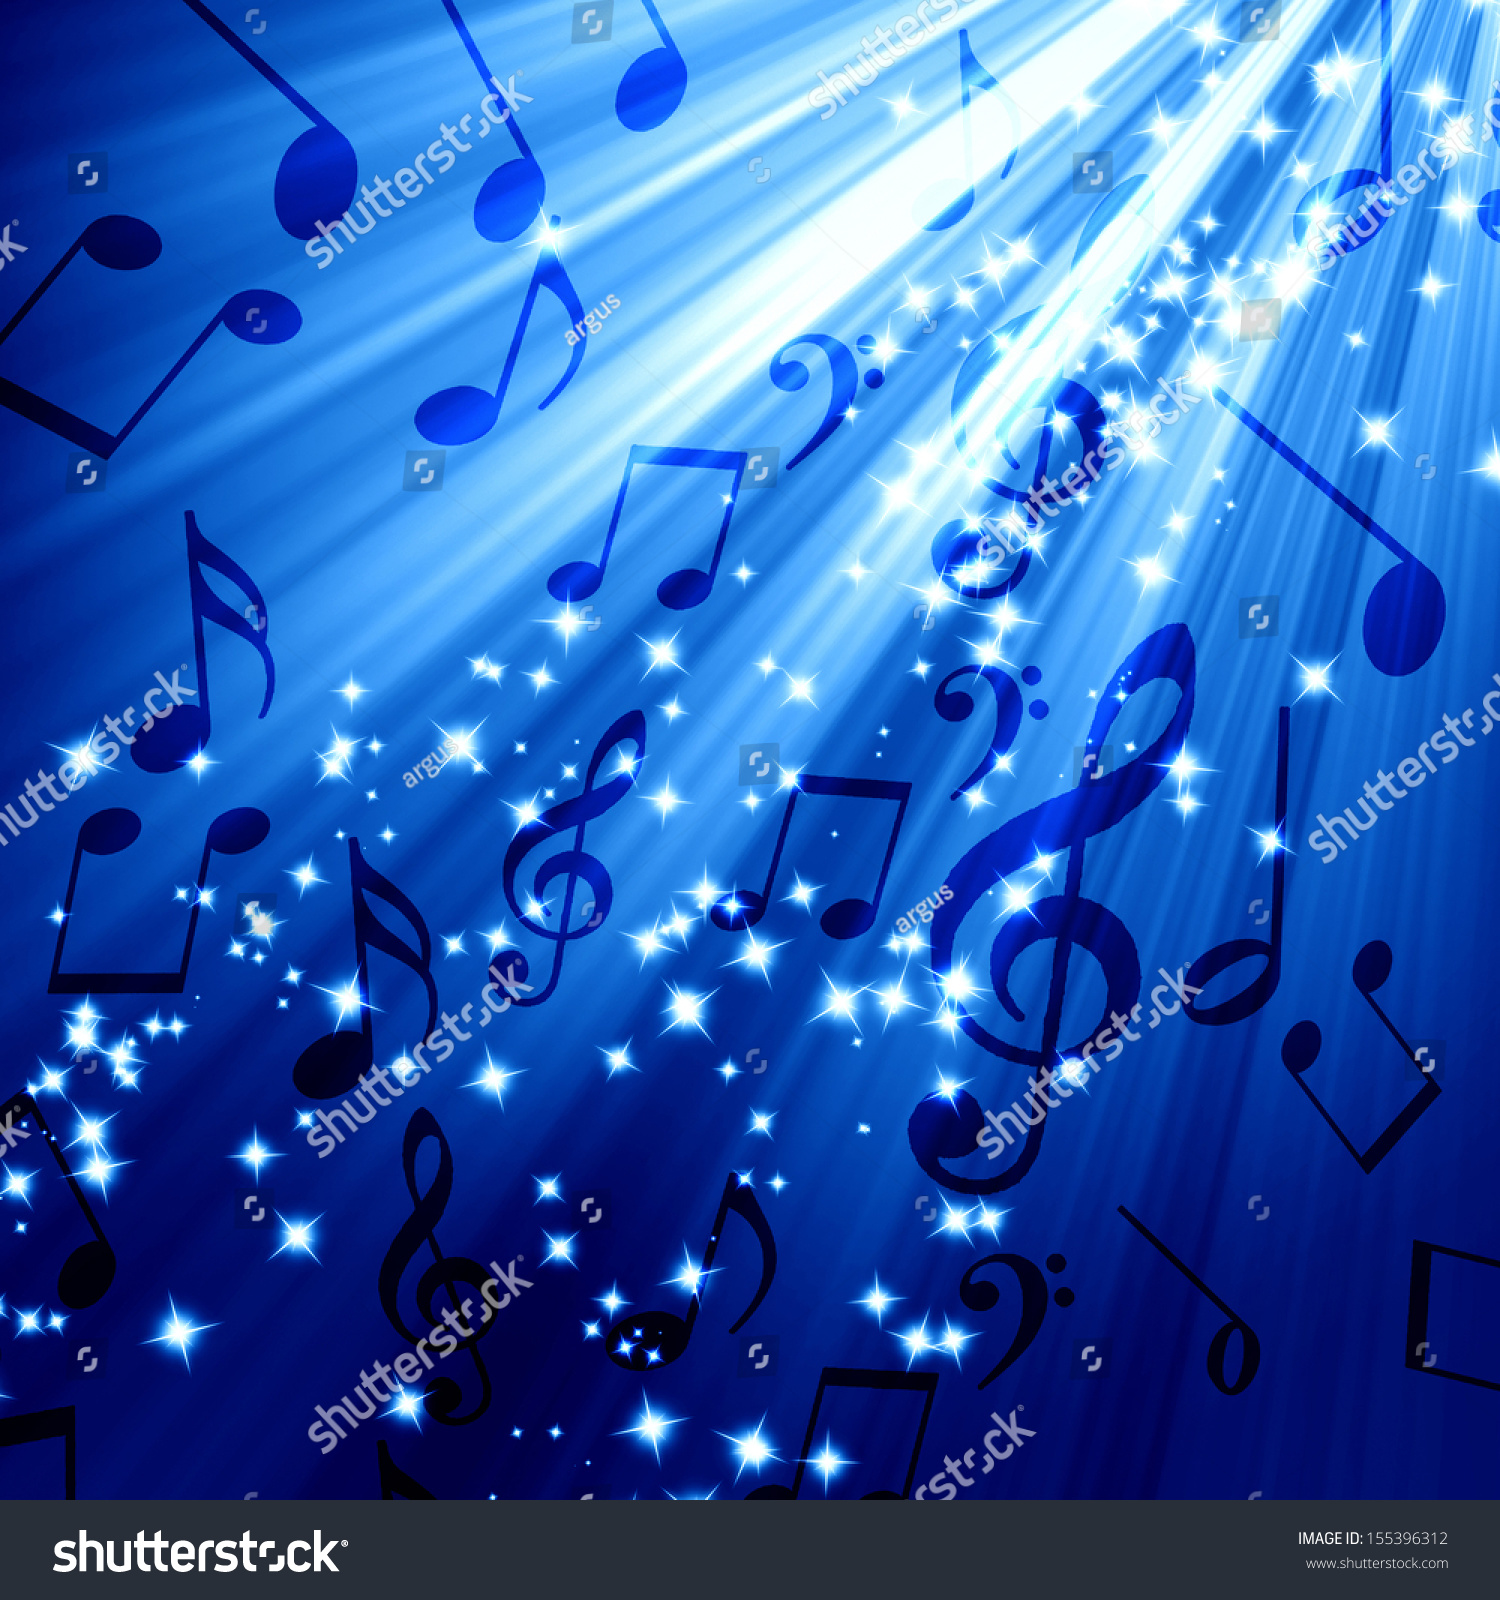 soft blue background some music notes stock illustration